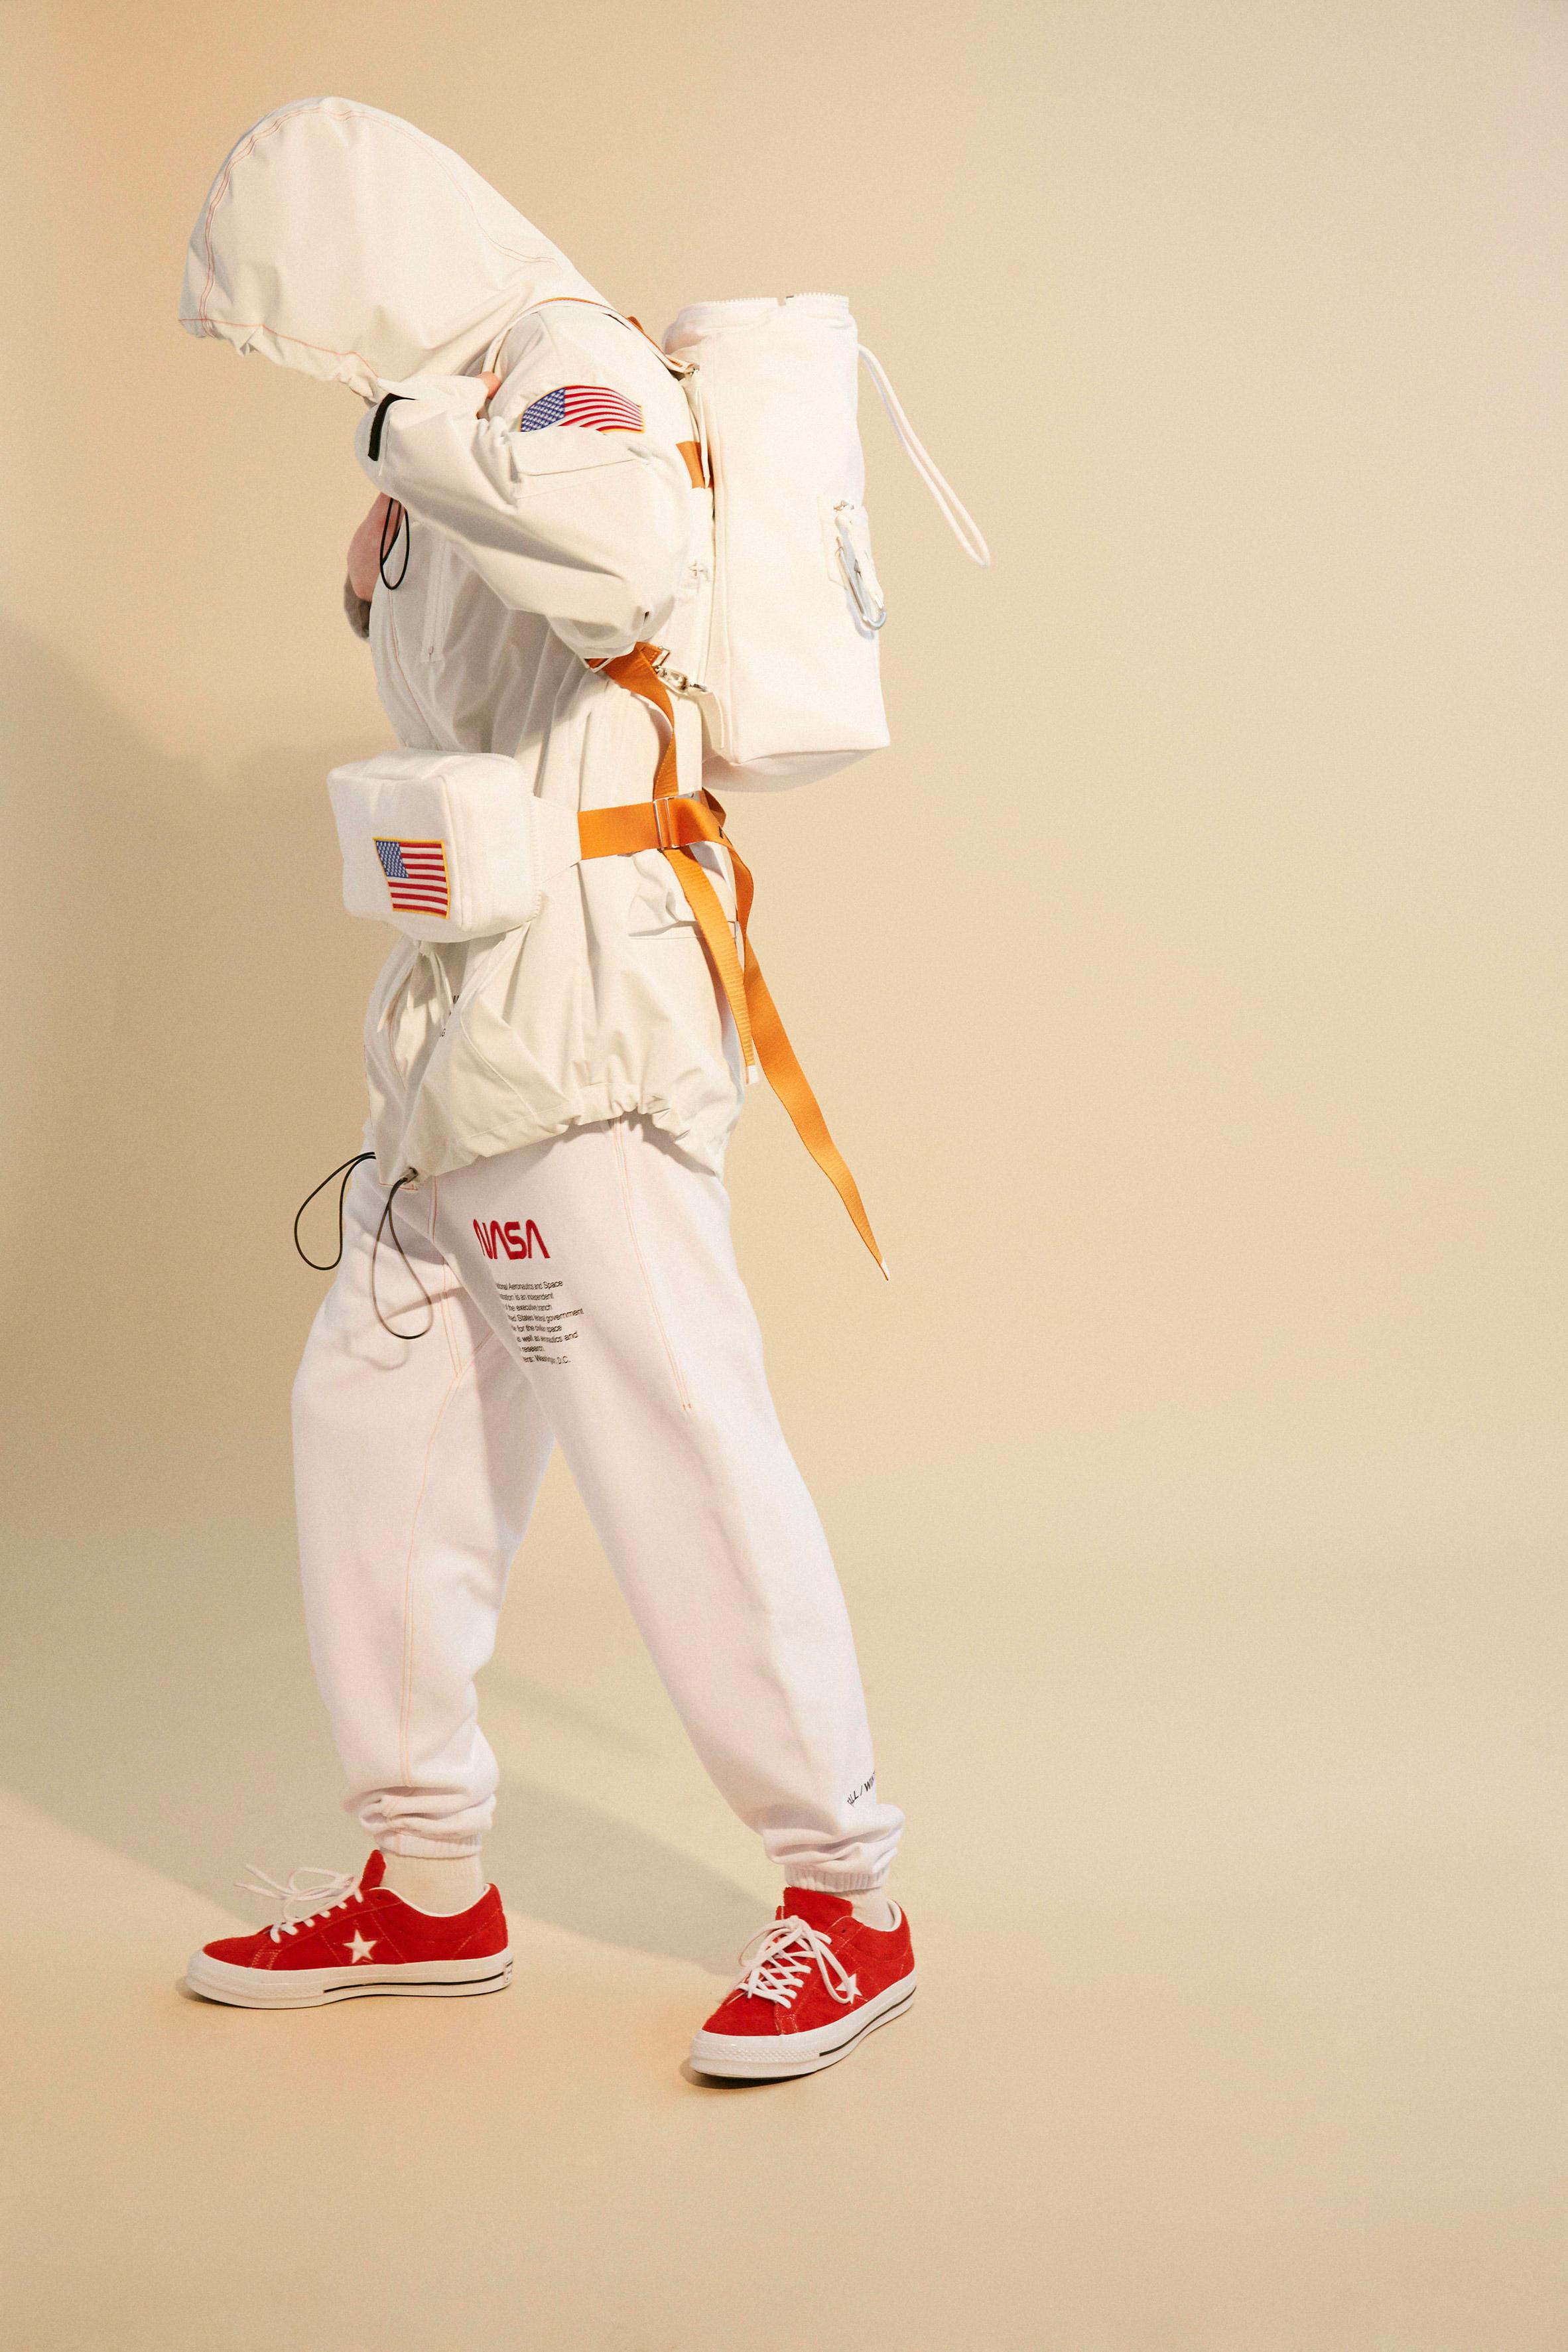 heron-preston-nasa-anniversary-clothing-range-fashion_dezeen_2364_col_3.jpg